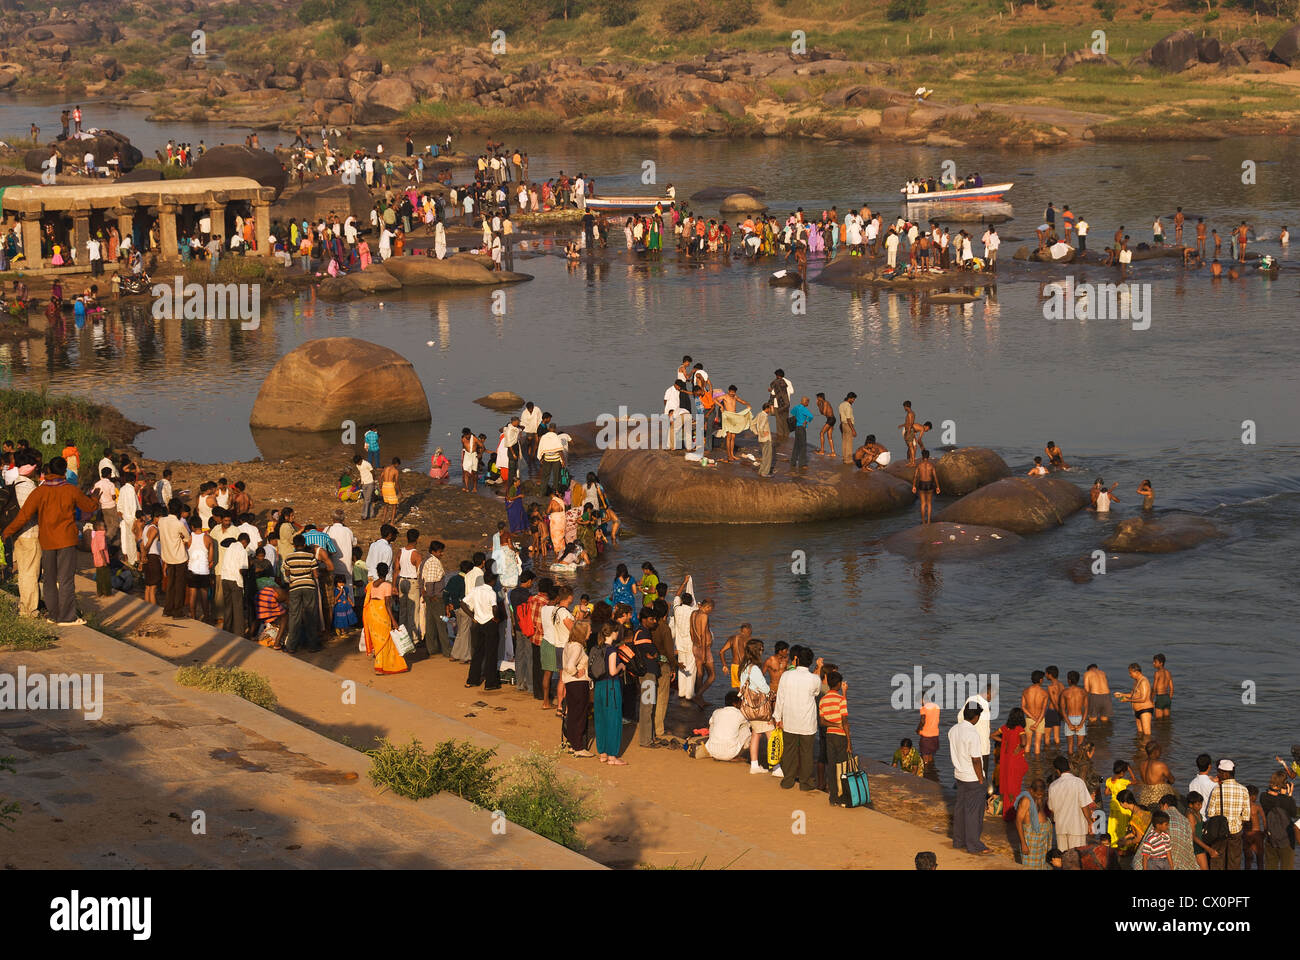 Elk201-2483 India, Karnataka, Hampi, Tungabhadra River, bathers for Pongol festival - Stock Image